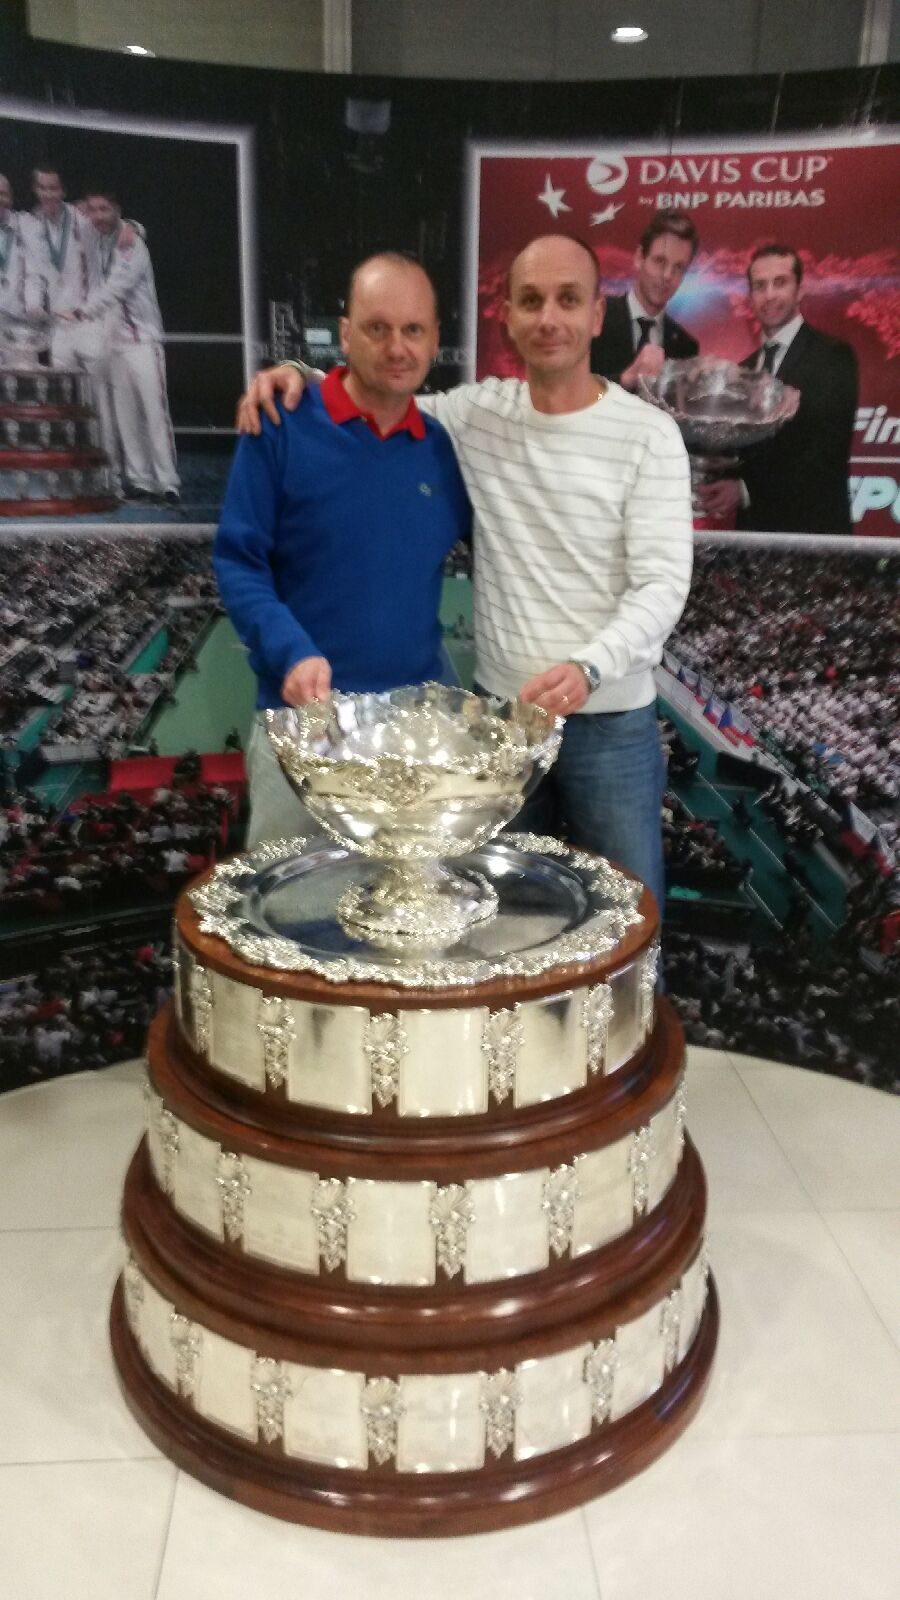 Trenéři Martin Wirgler a Jirka Hanák s pohárem Davis Cupu